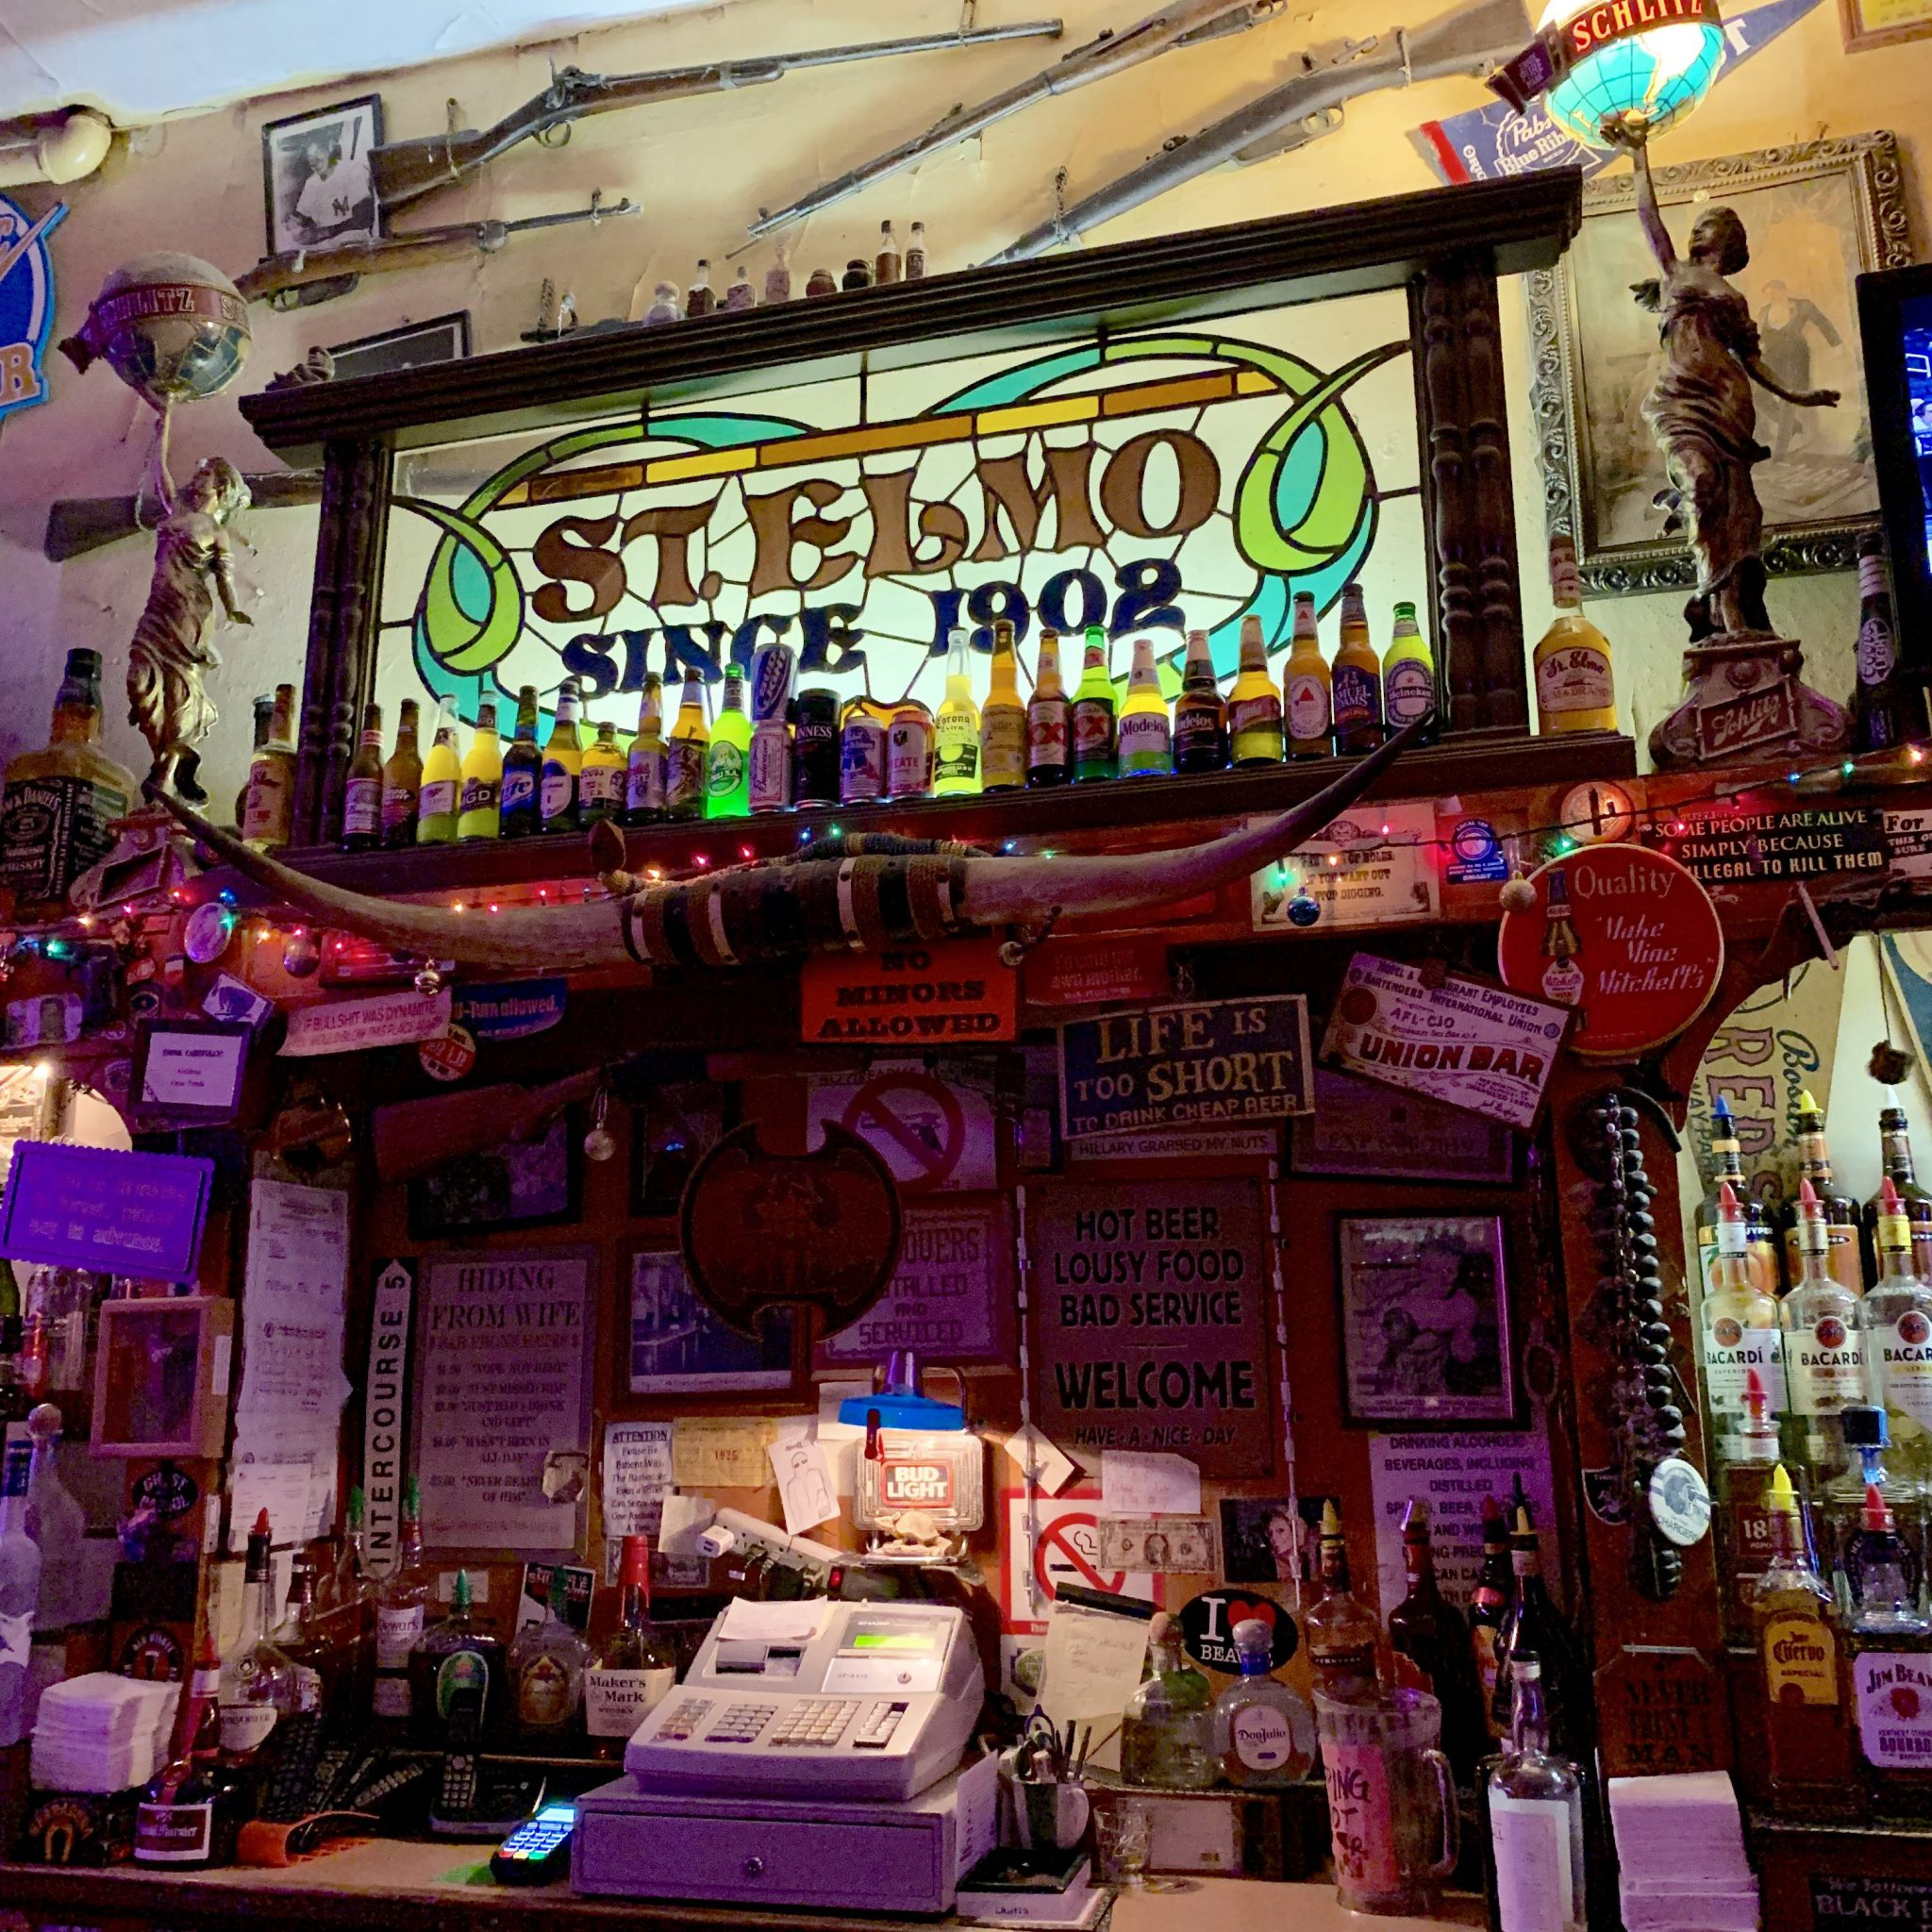 St. Elmo's Bisbee